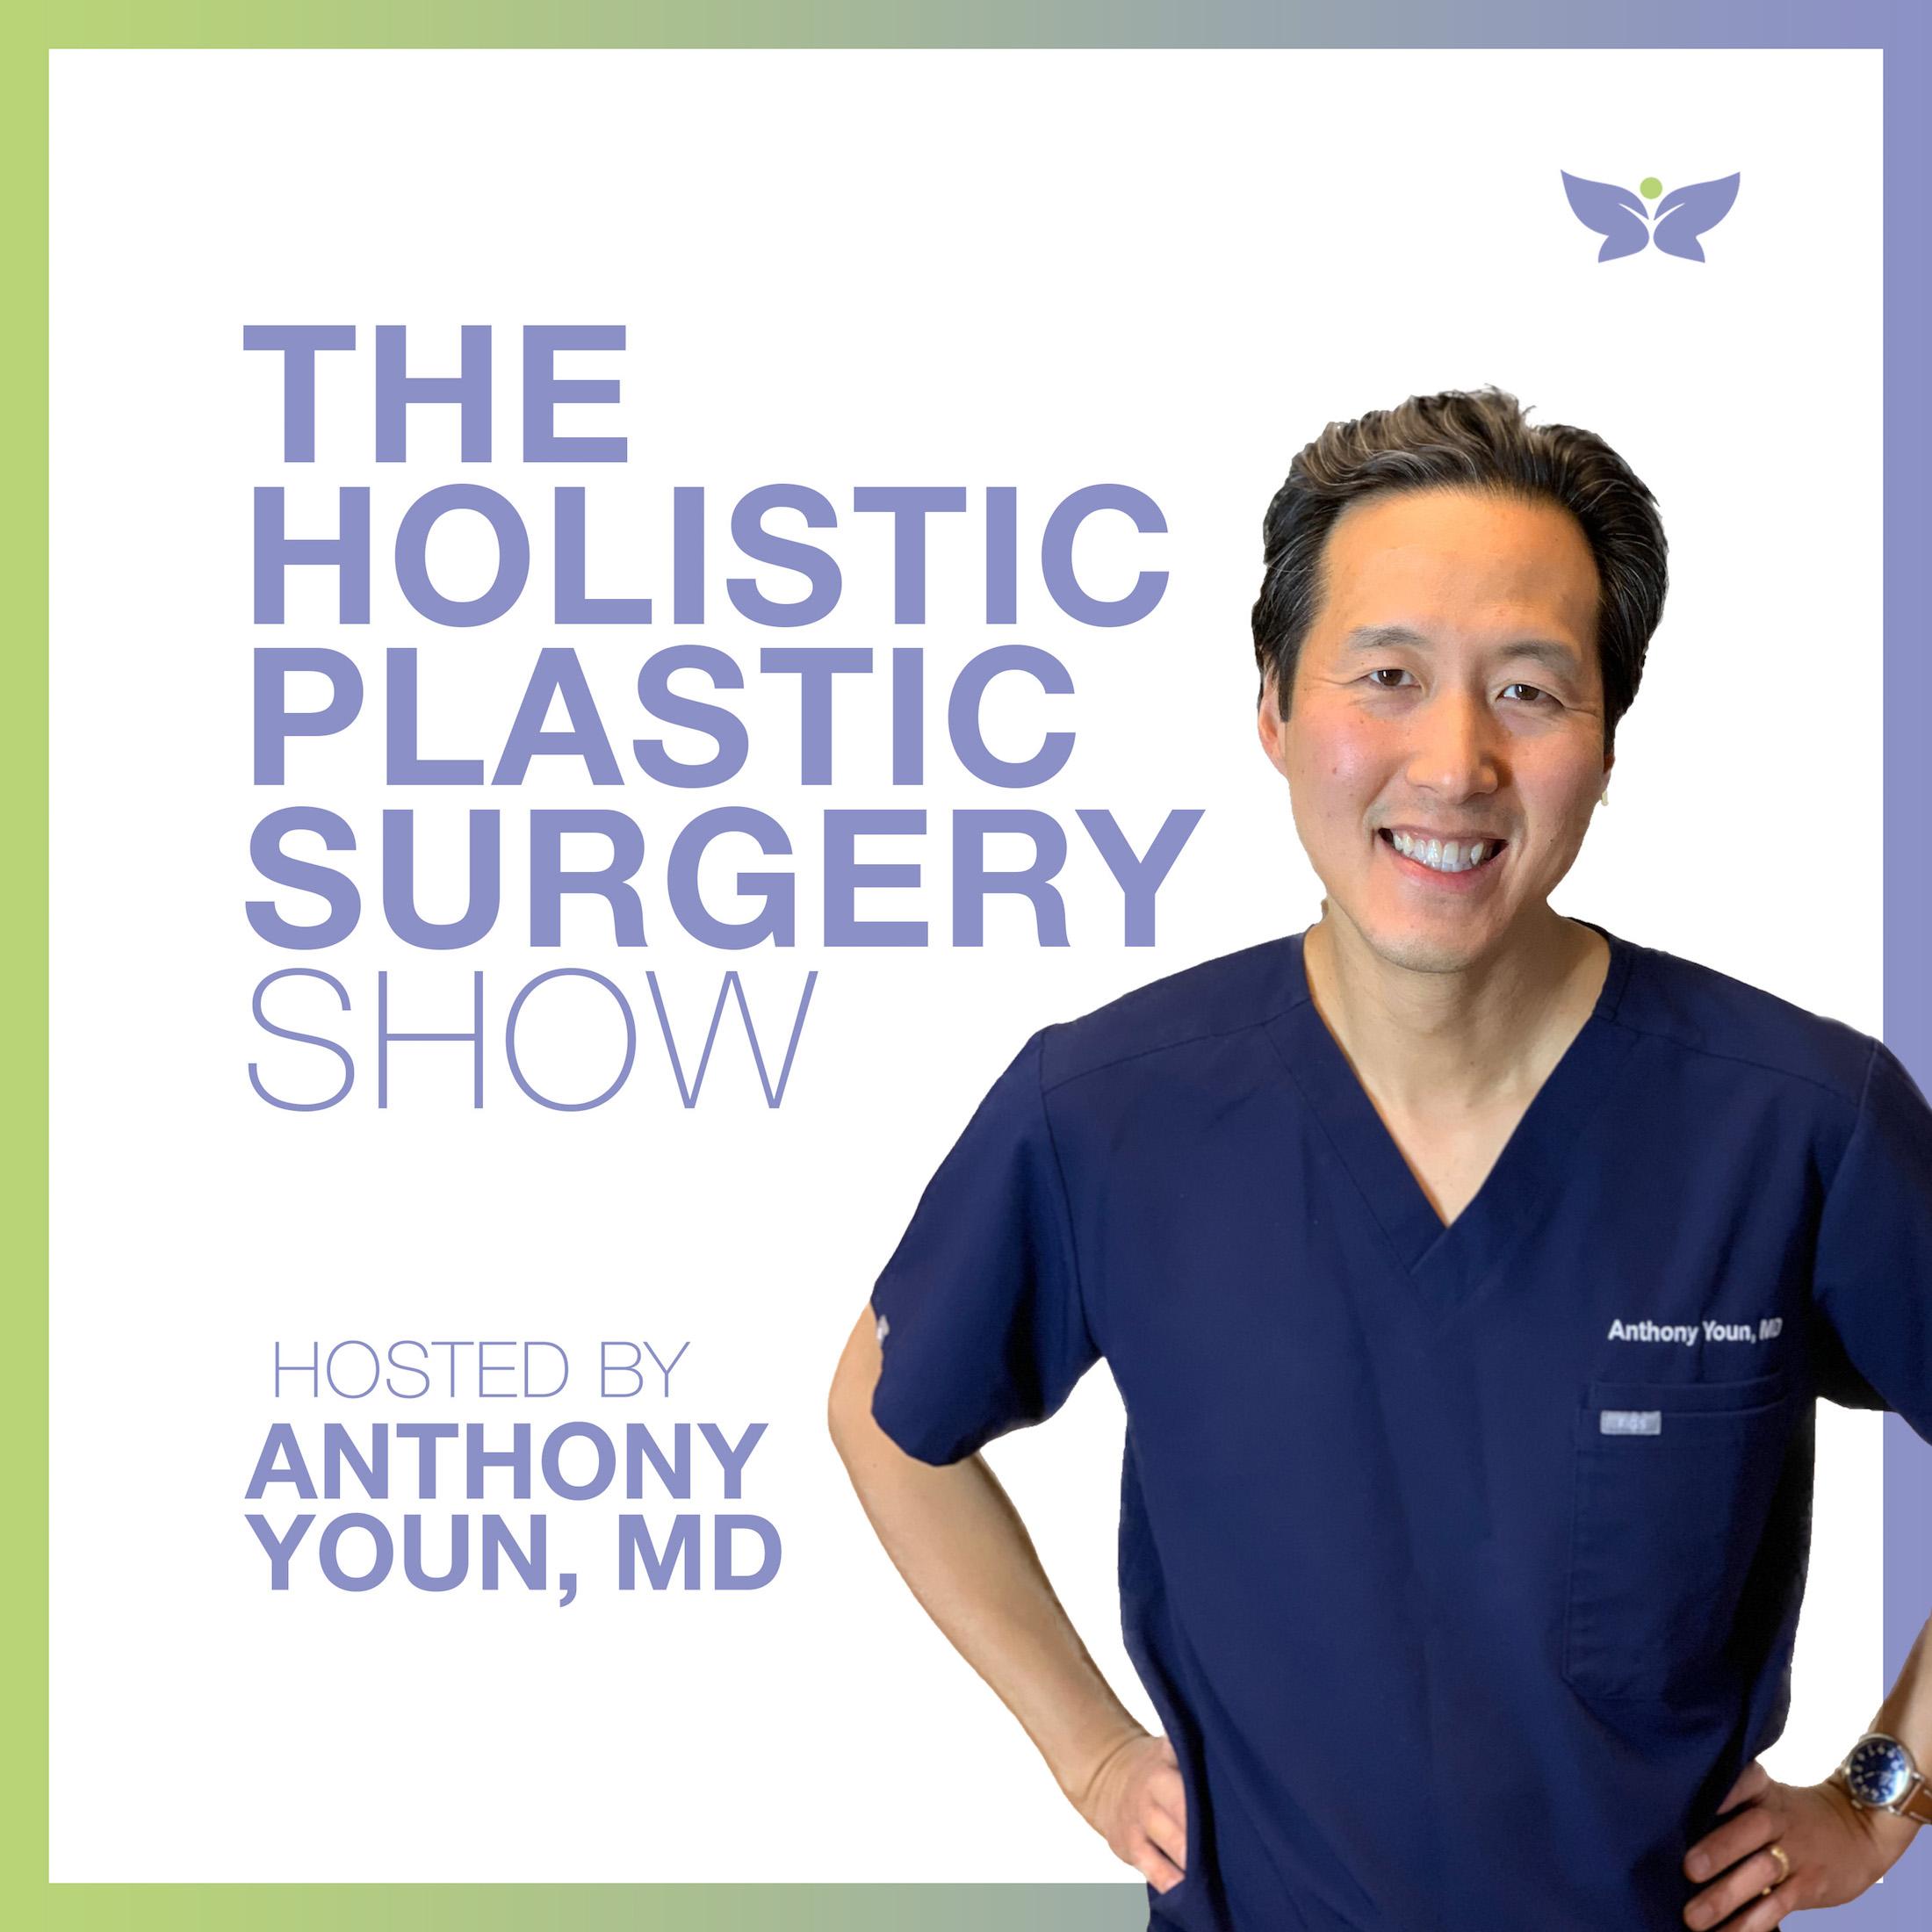 Holistic Plastic Surgery Show show art